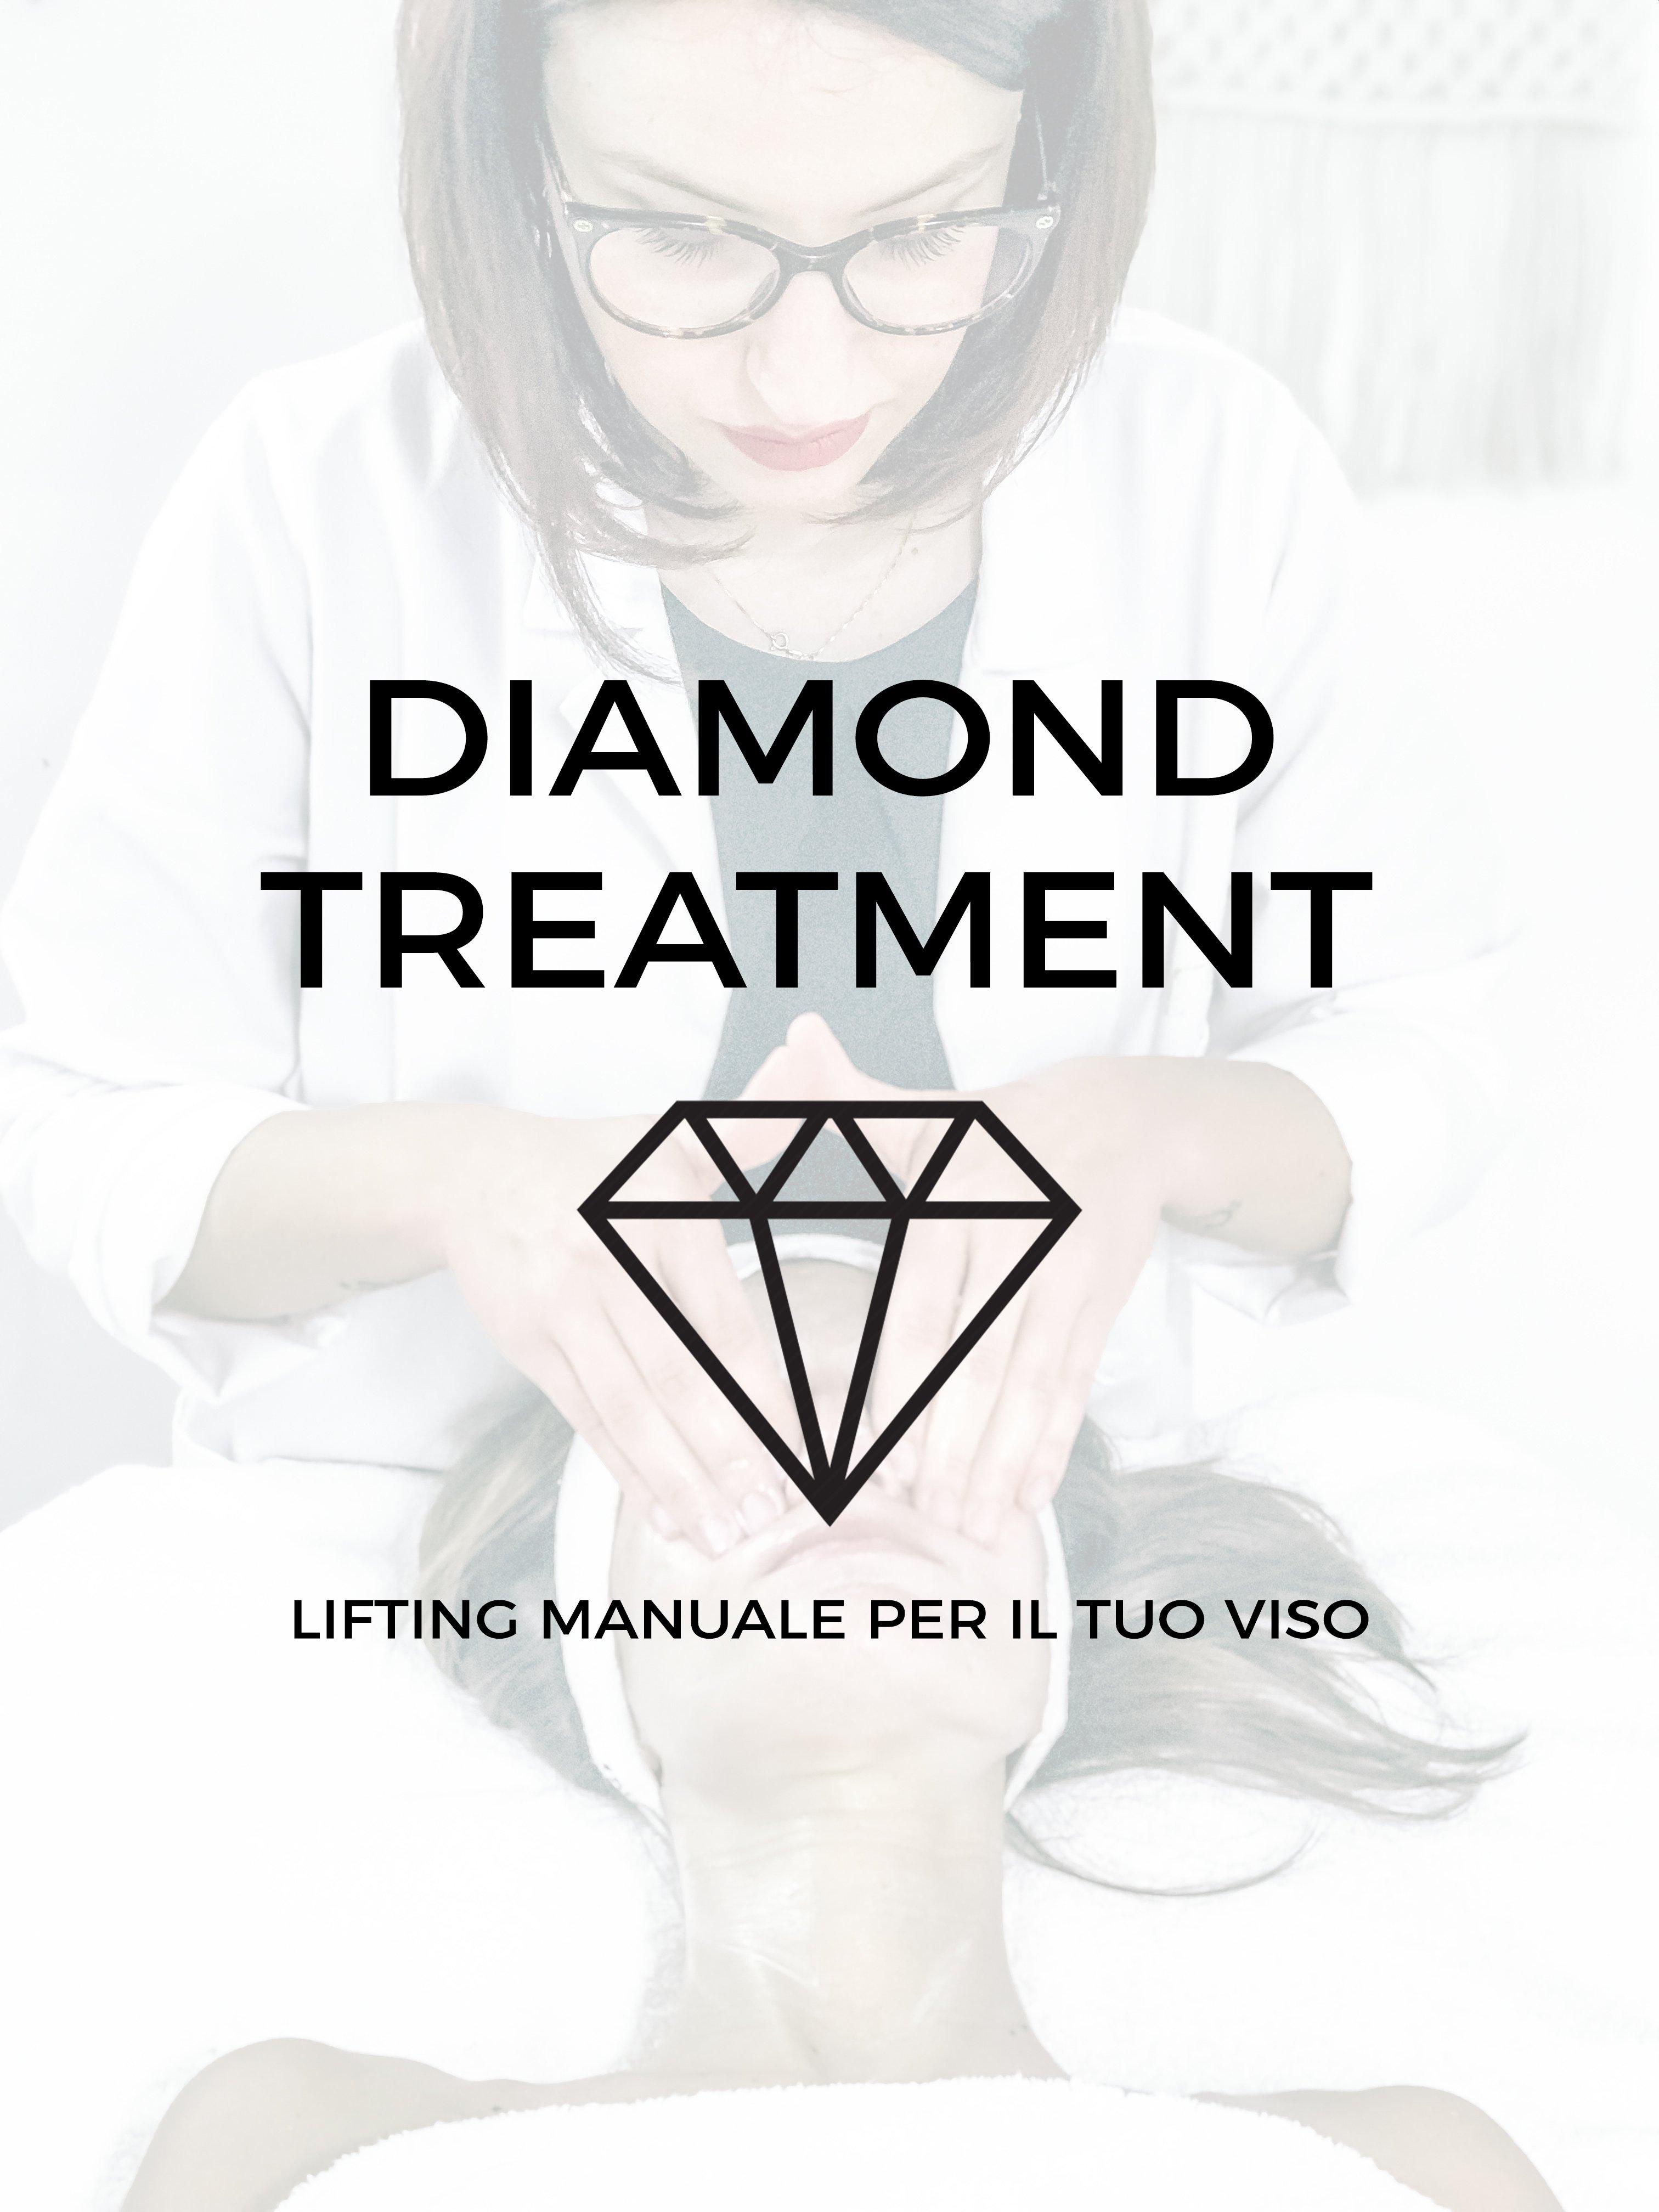 Diamond Treatment - 970€